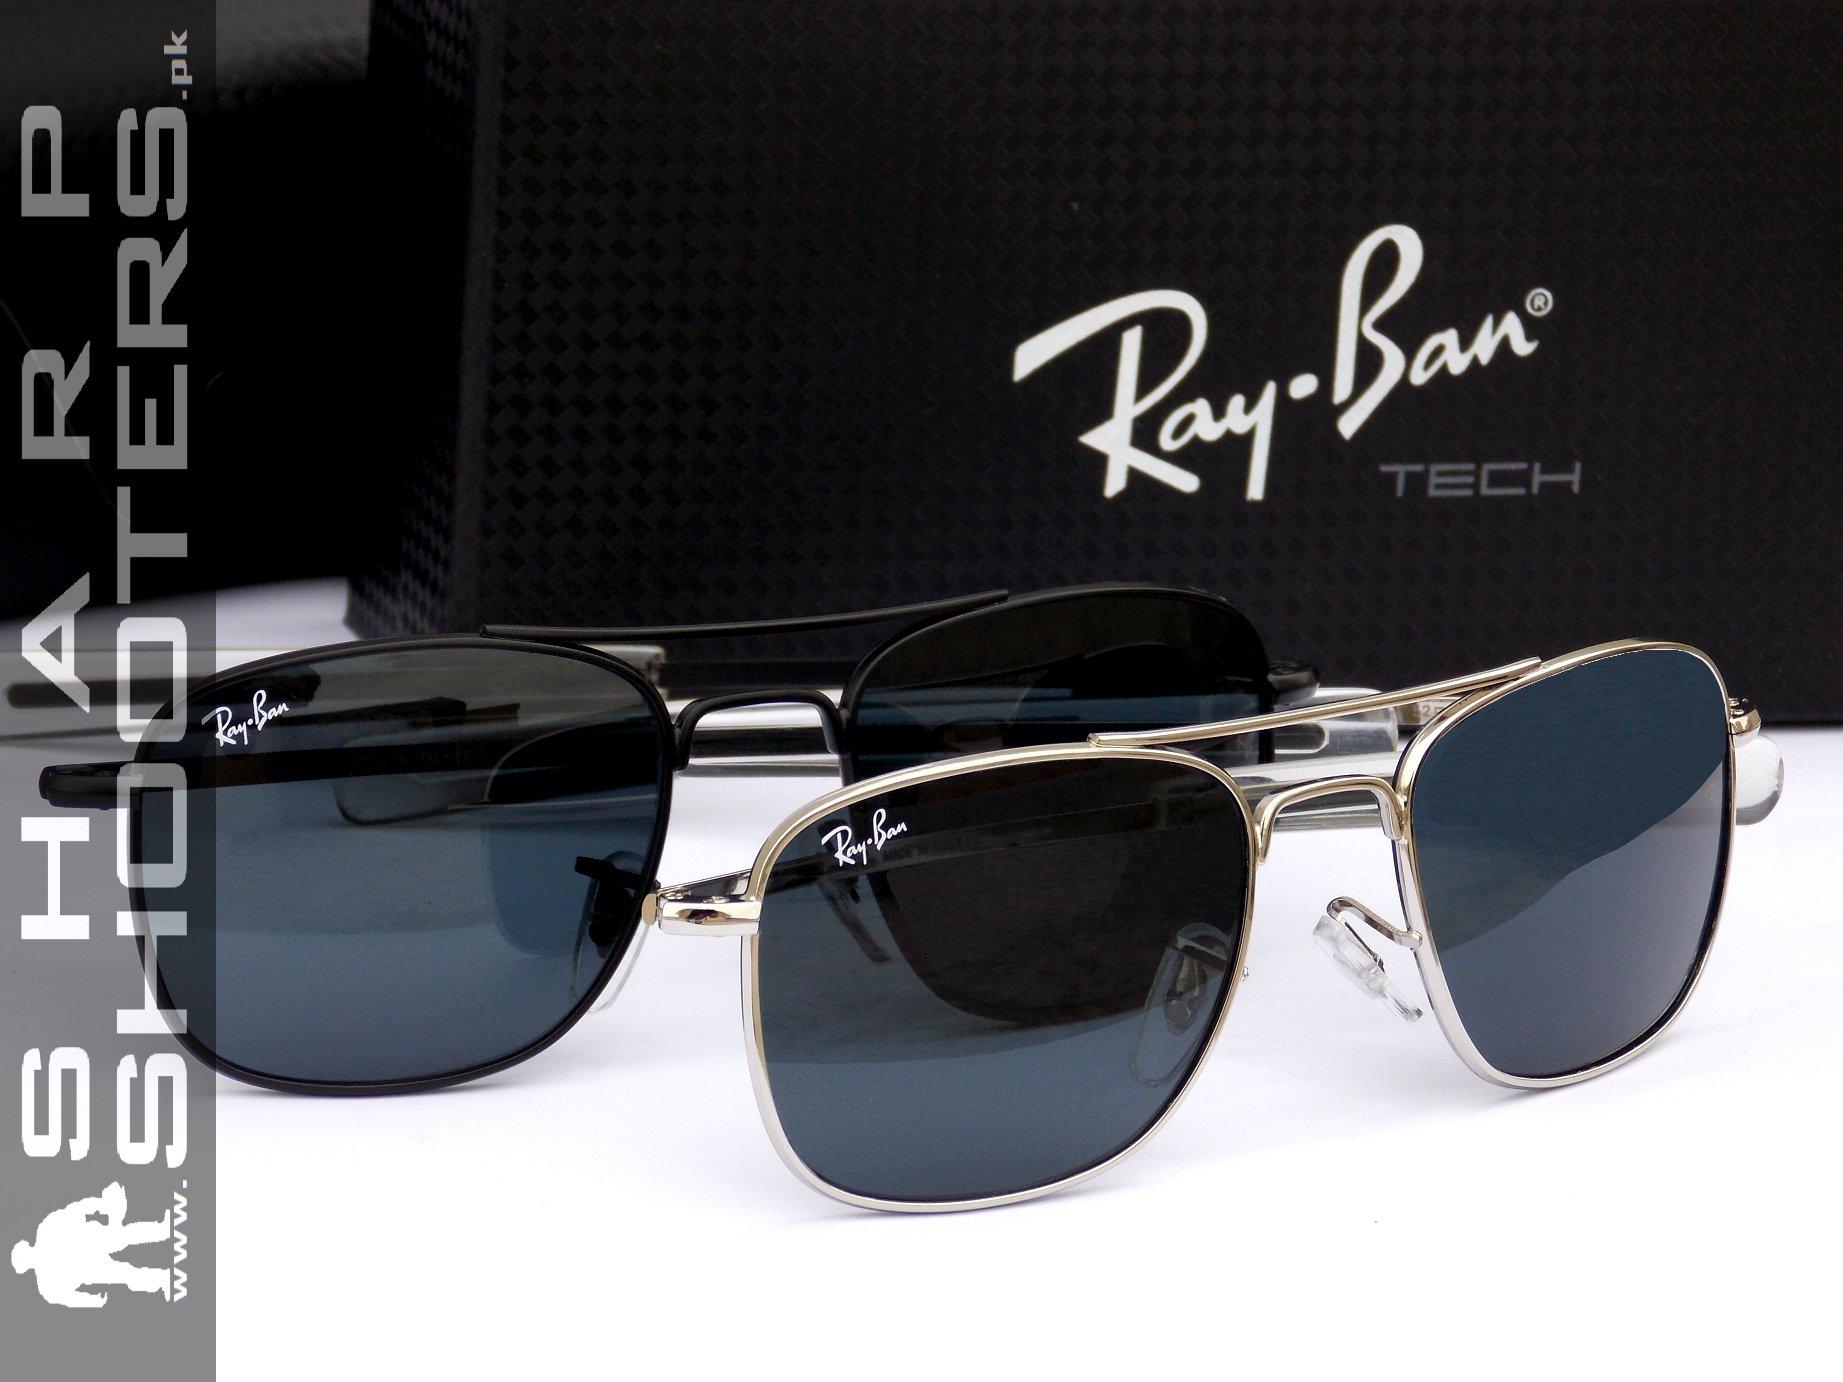 american aviator sunglasses  American Optical aviator sunglasses \u2013 Sharp Shooters.pk